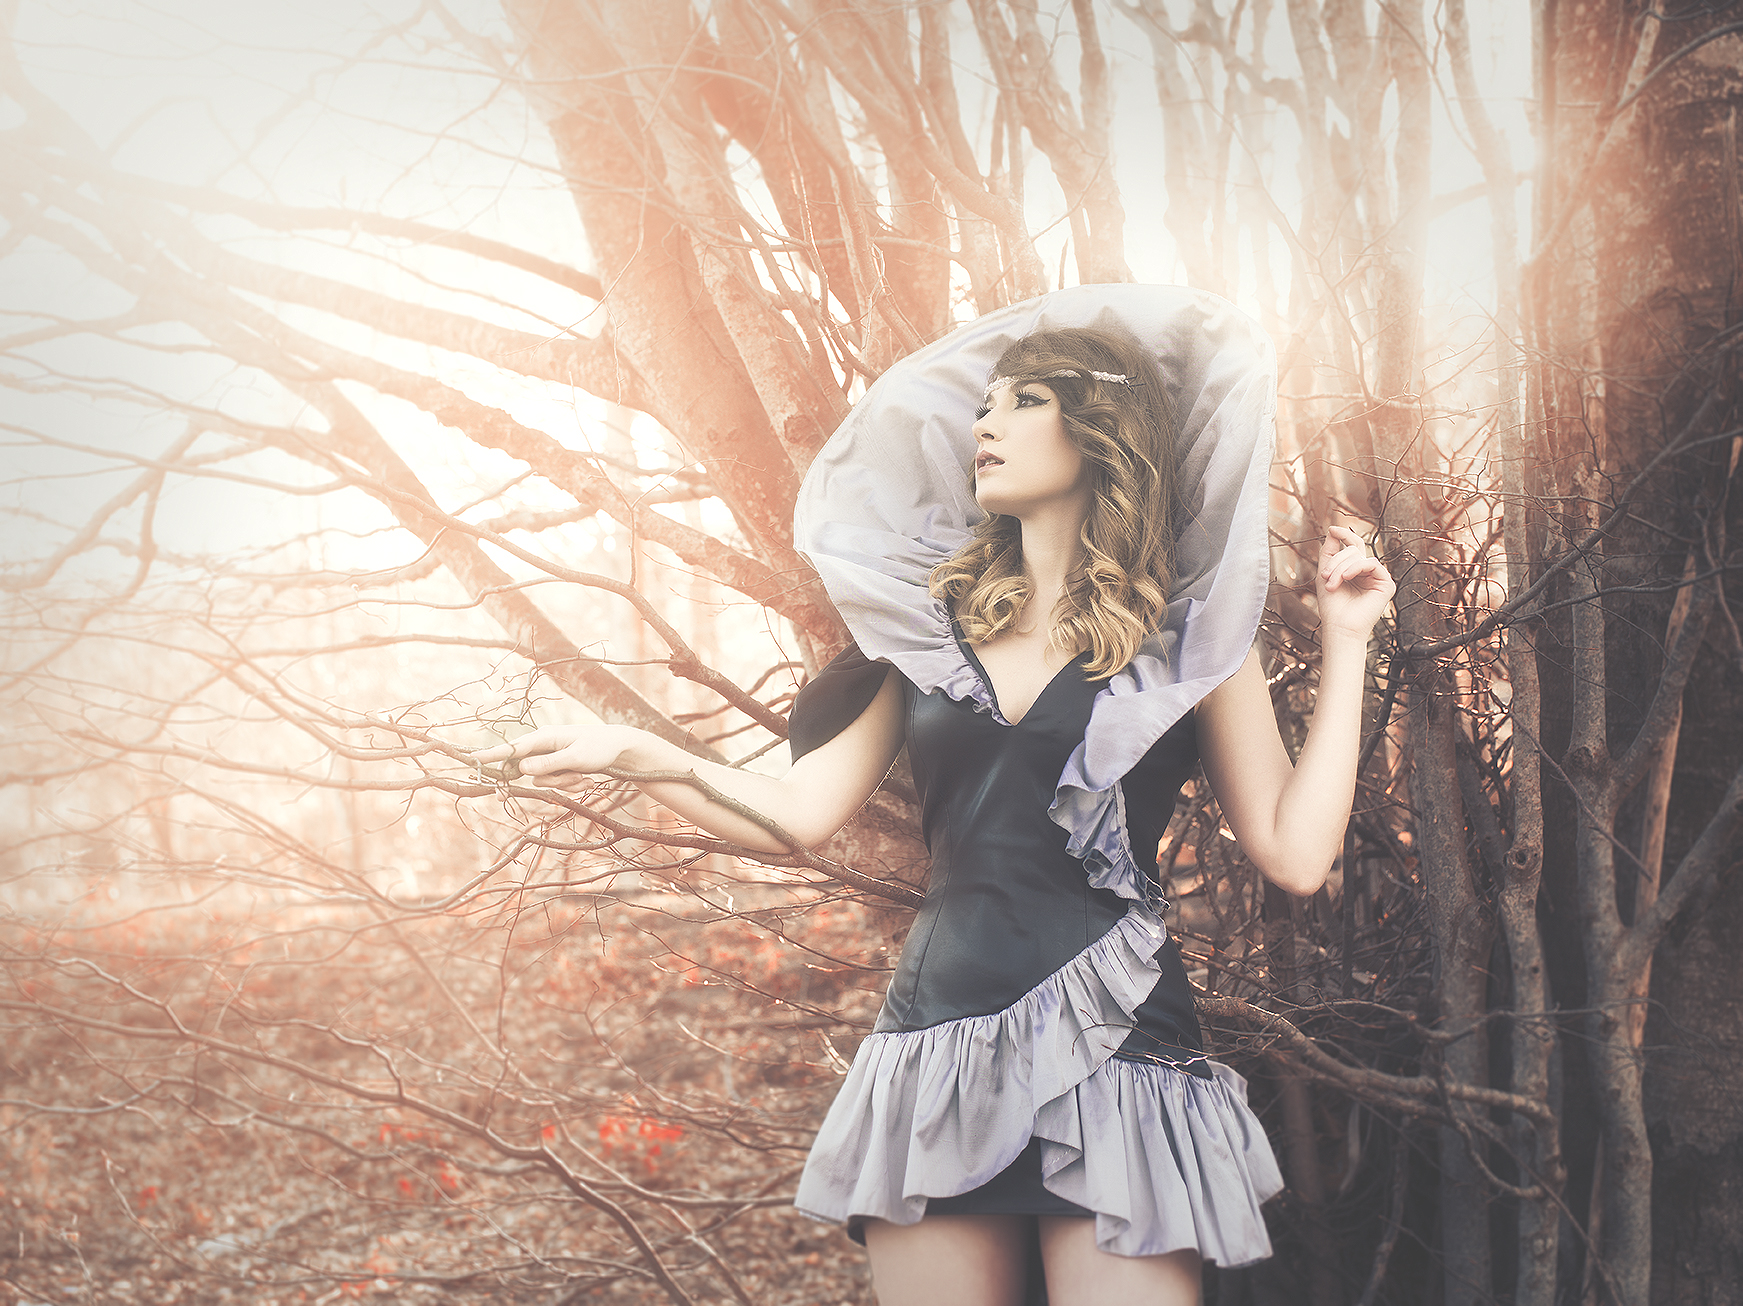 Model: Elia Carpio  Make-up: Alassie Styling: Avalon Saez  Photo/Edition: RebecaSaray with Pentax645D